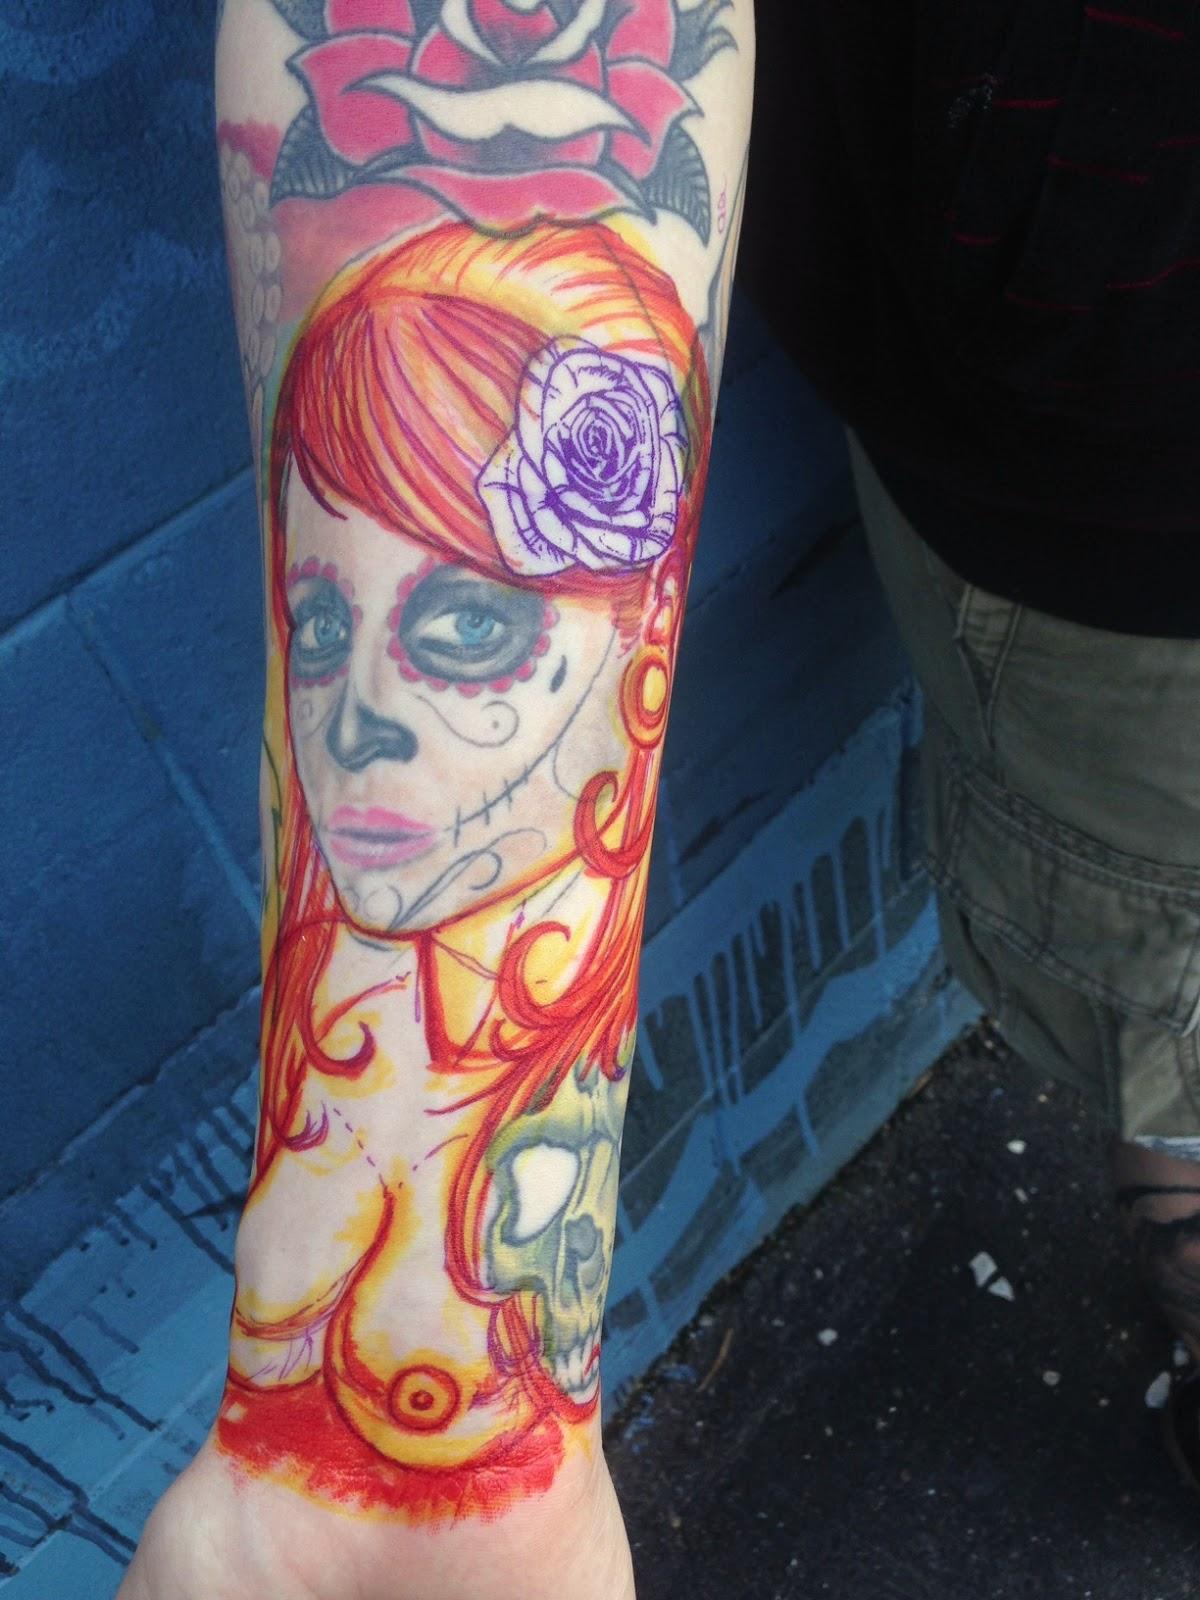 Tattoos & Art by: DAVID EKSTROM: day of dead girl REWORK/COVERUP